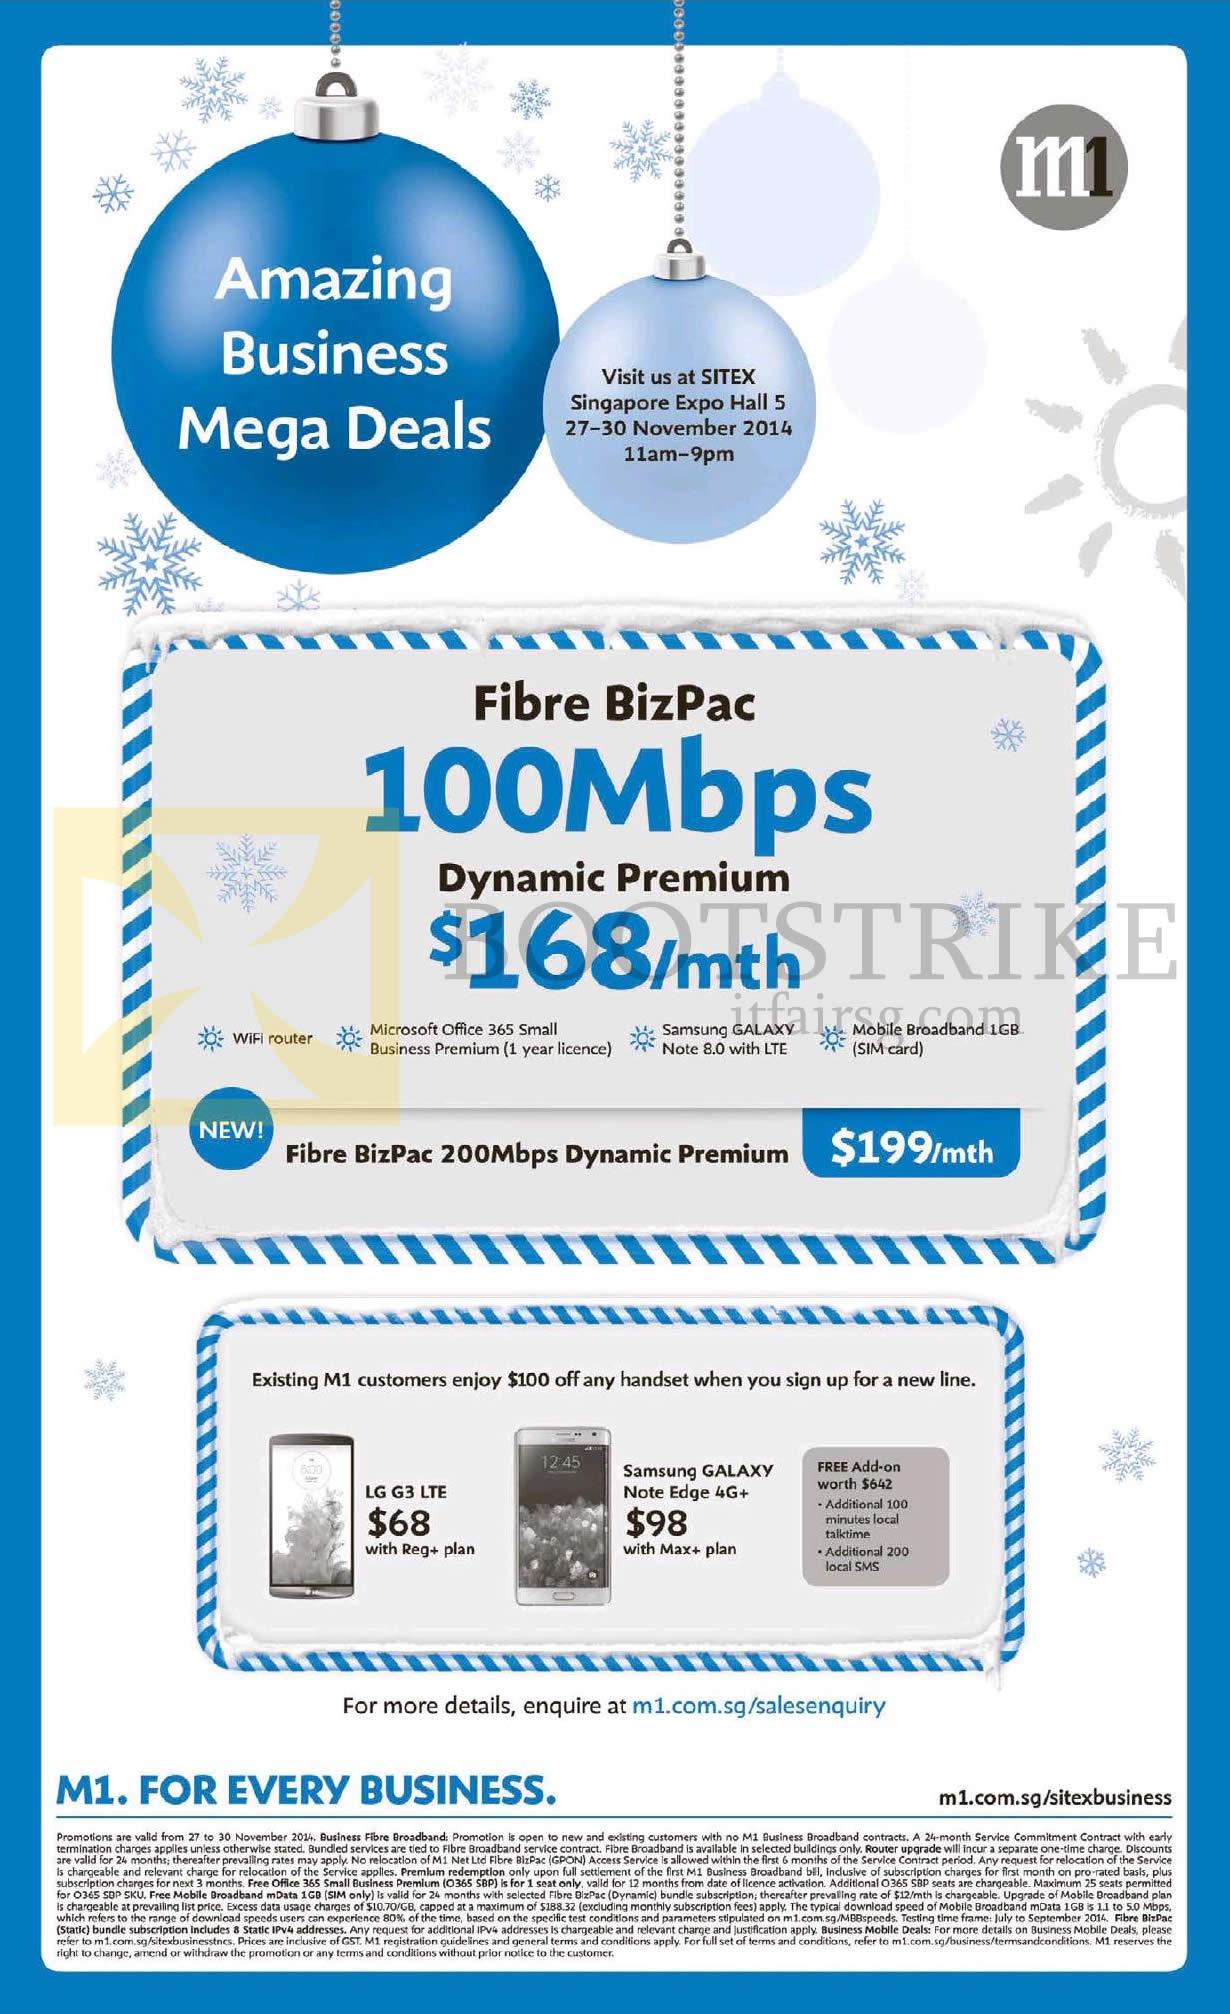 SITEX 2014 price list image brochure of M1 Business Fibre BizPac 100Mbps Dynamic Premium, LG G3, Samsung Galaxy Note Edge